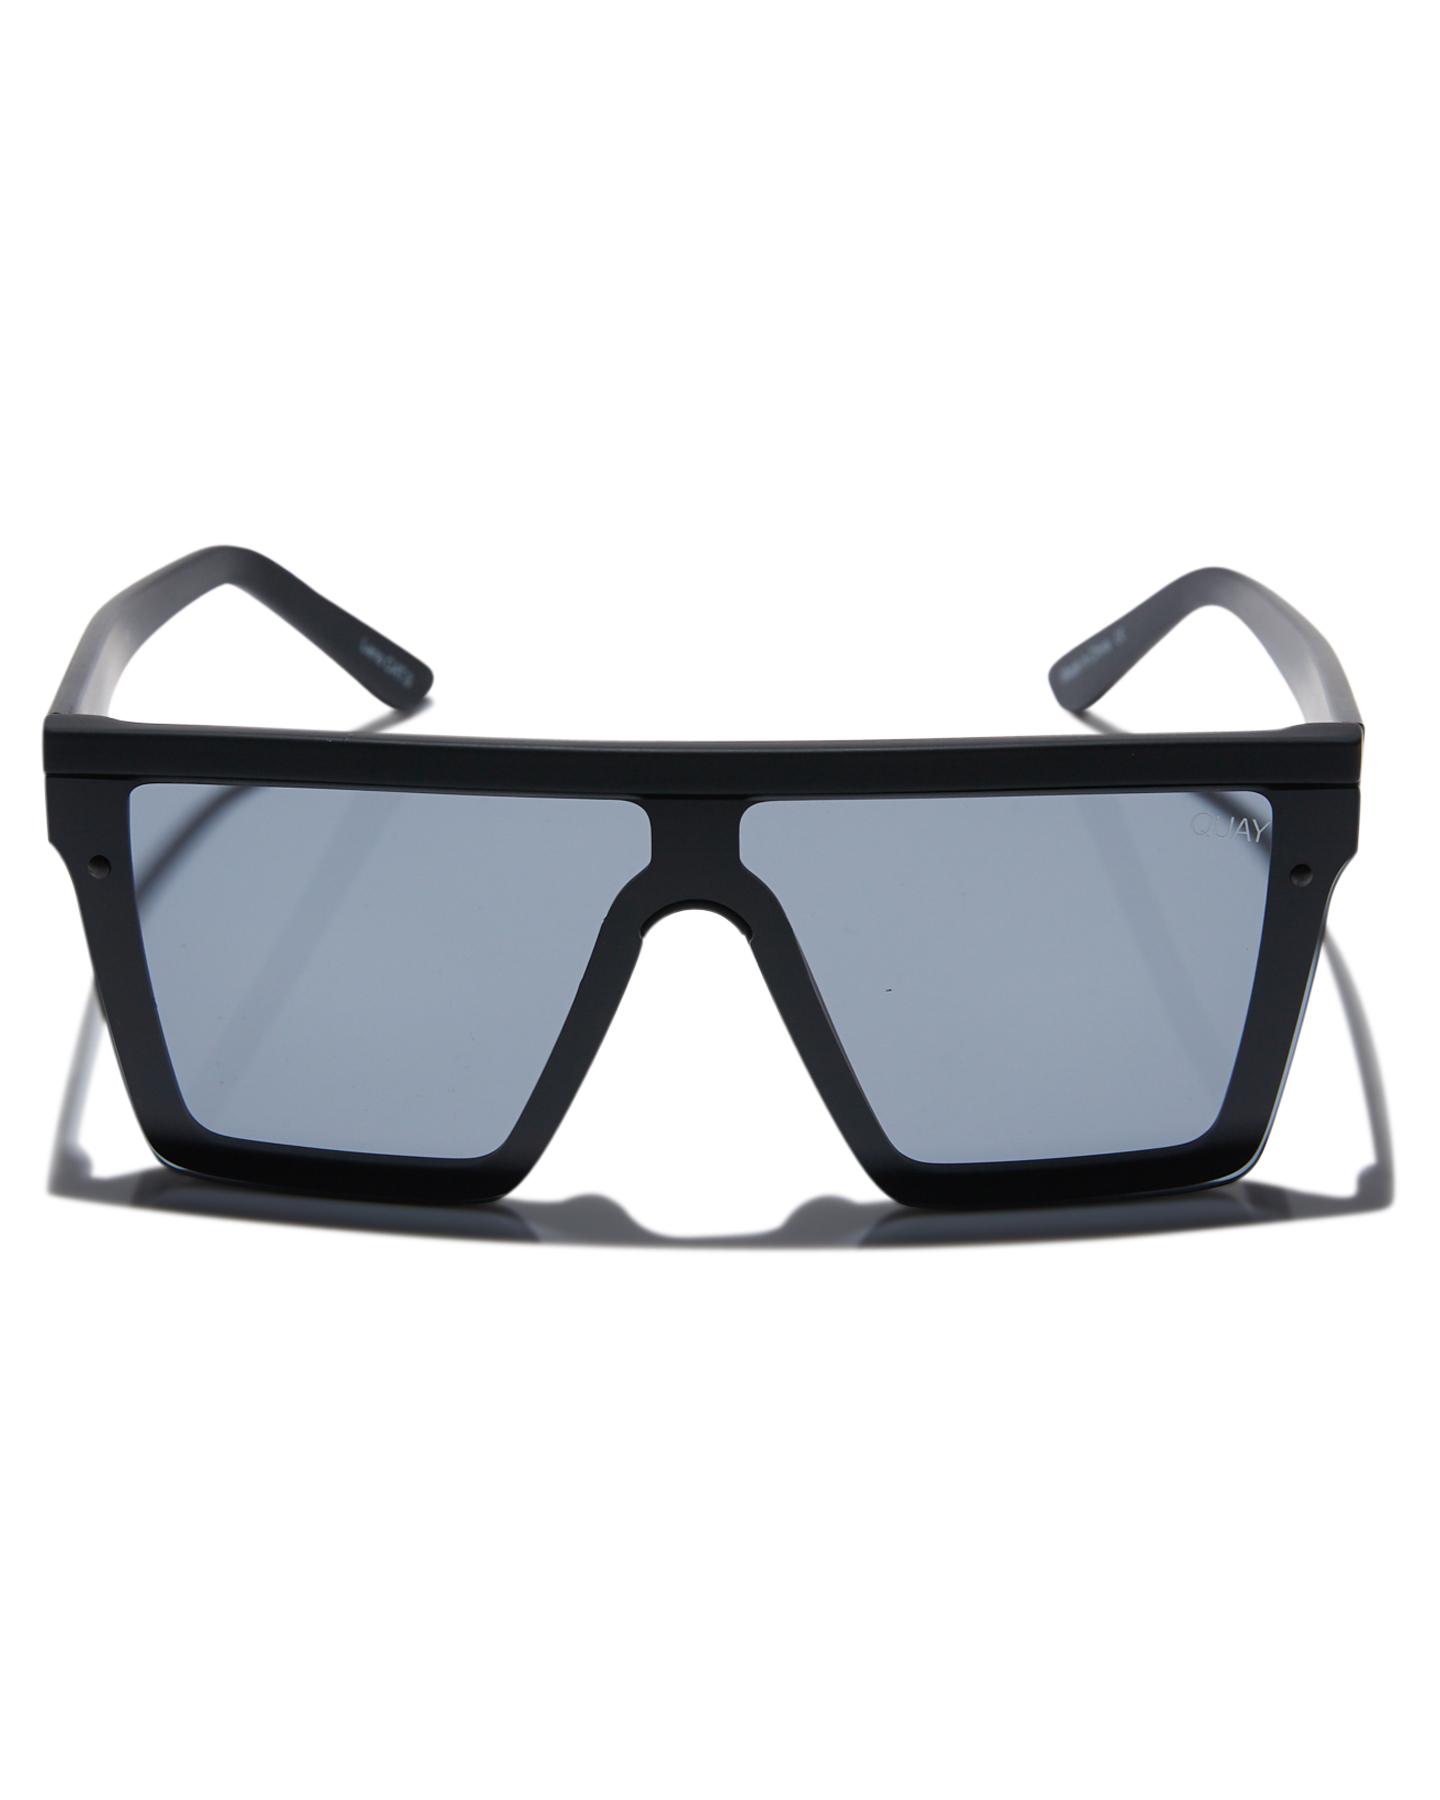 New-Quay-Eyewear-Women-039-s-Hindsight-Sunglasses-Stainless-Steel-Glass-Pink thumbnail 17